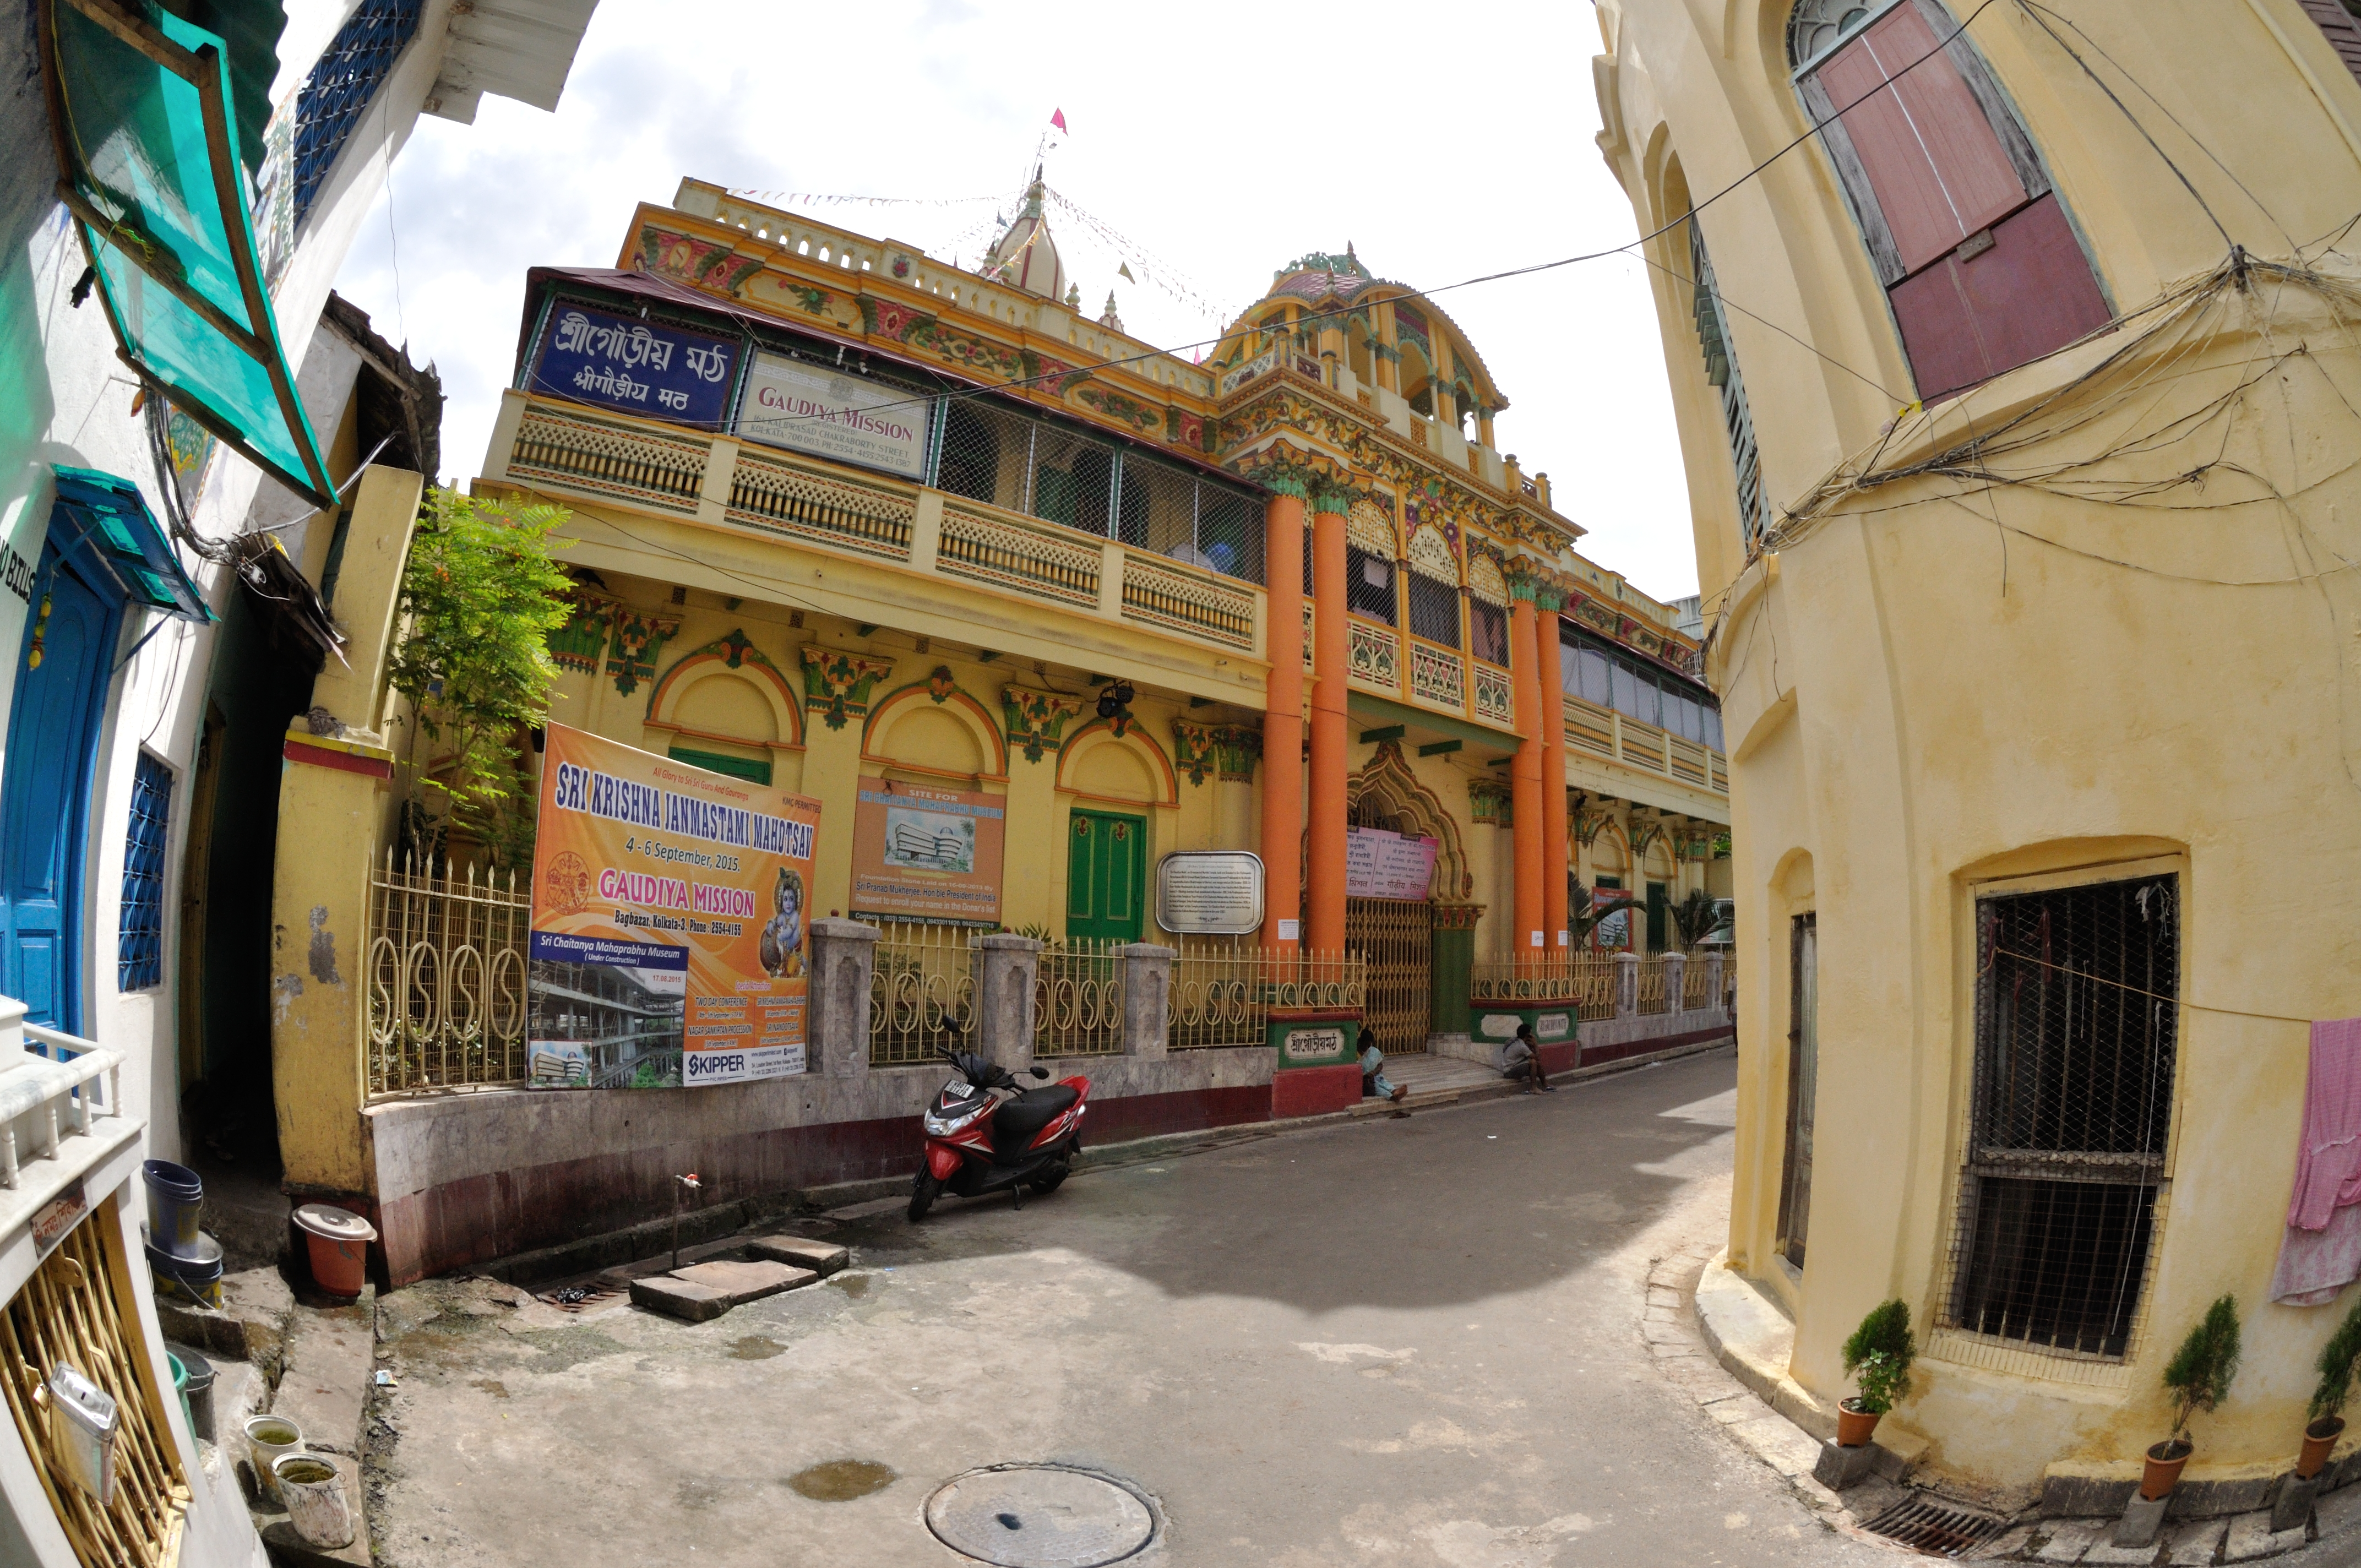 File:Gaudiya Math - 16A Kaliprasad Chakraborty Street